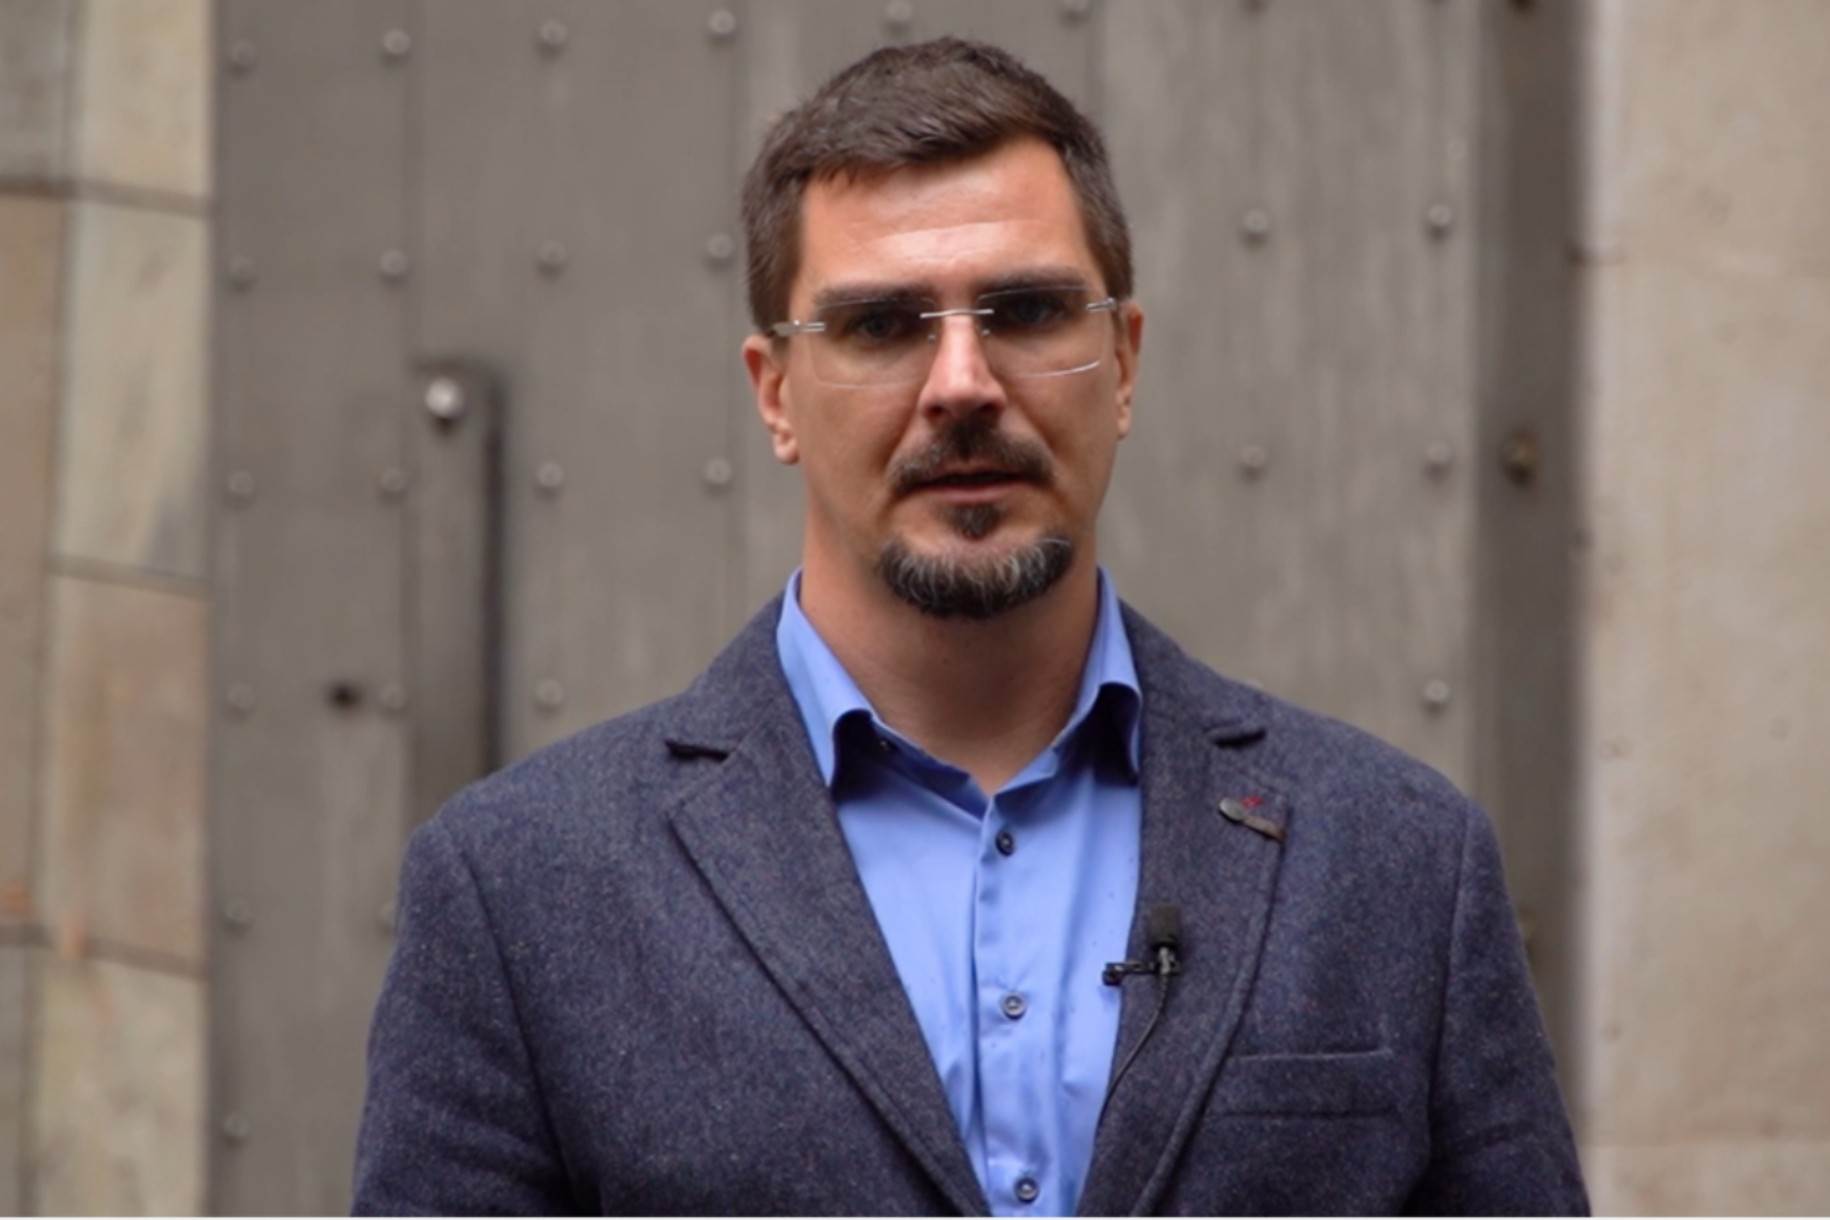 Deputy mayor of Ózd resigned due to Nazi photos